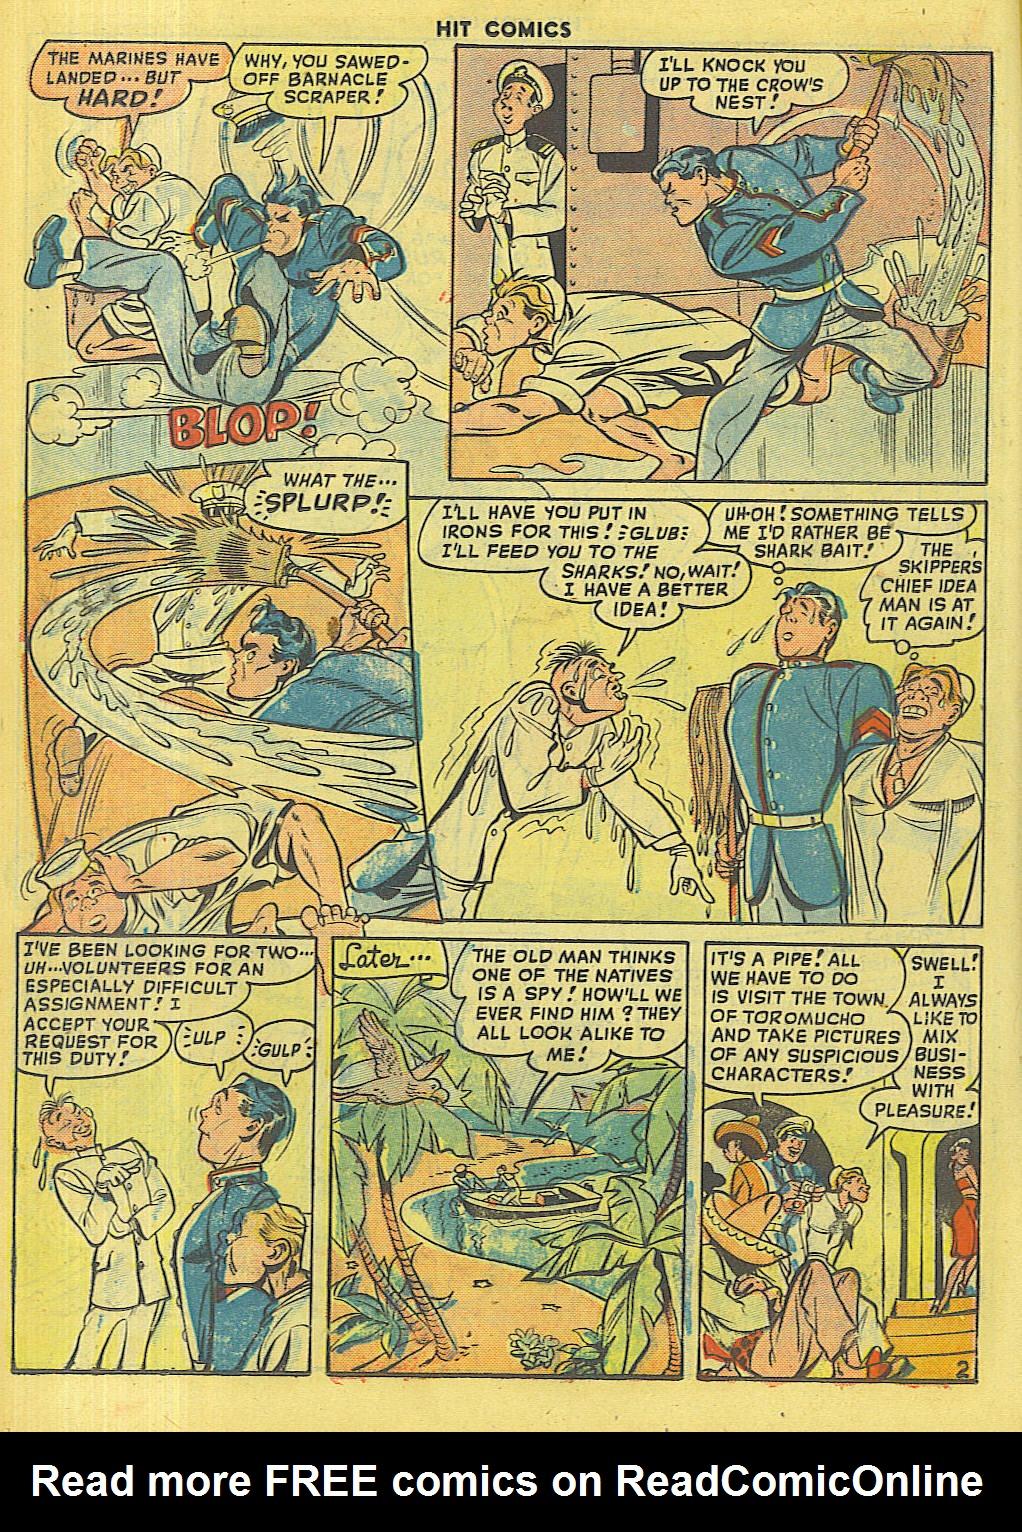 Read online Hit Comics comic -  Issue #56 - 22